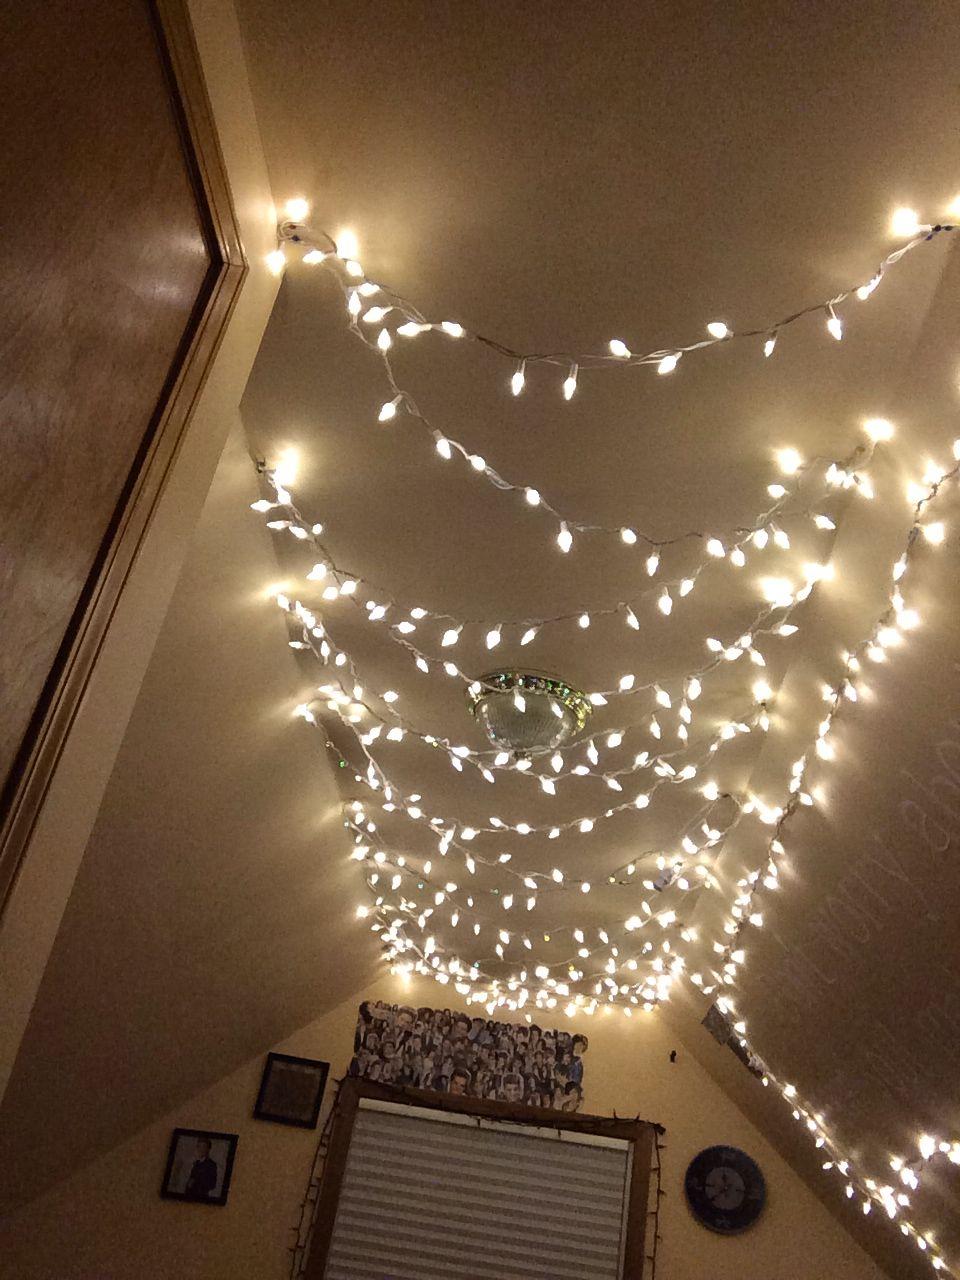 Lights Tumblr Room Christmas Lights Lights In Room Tumblr